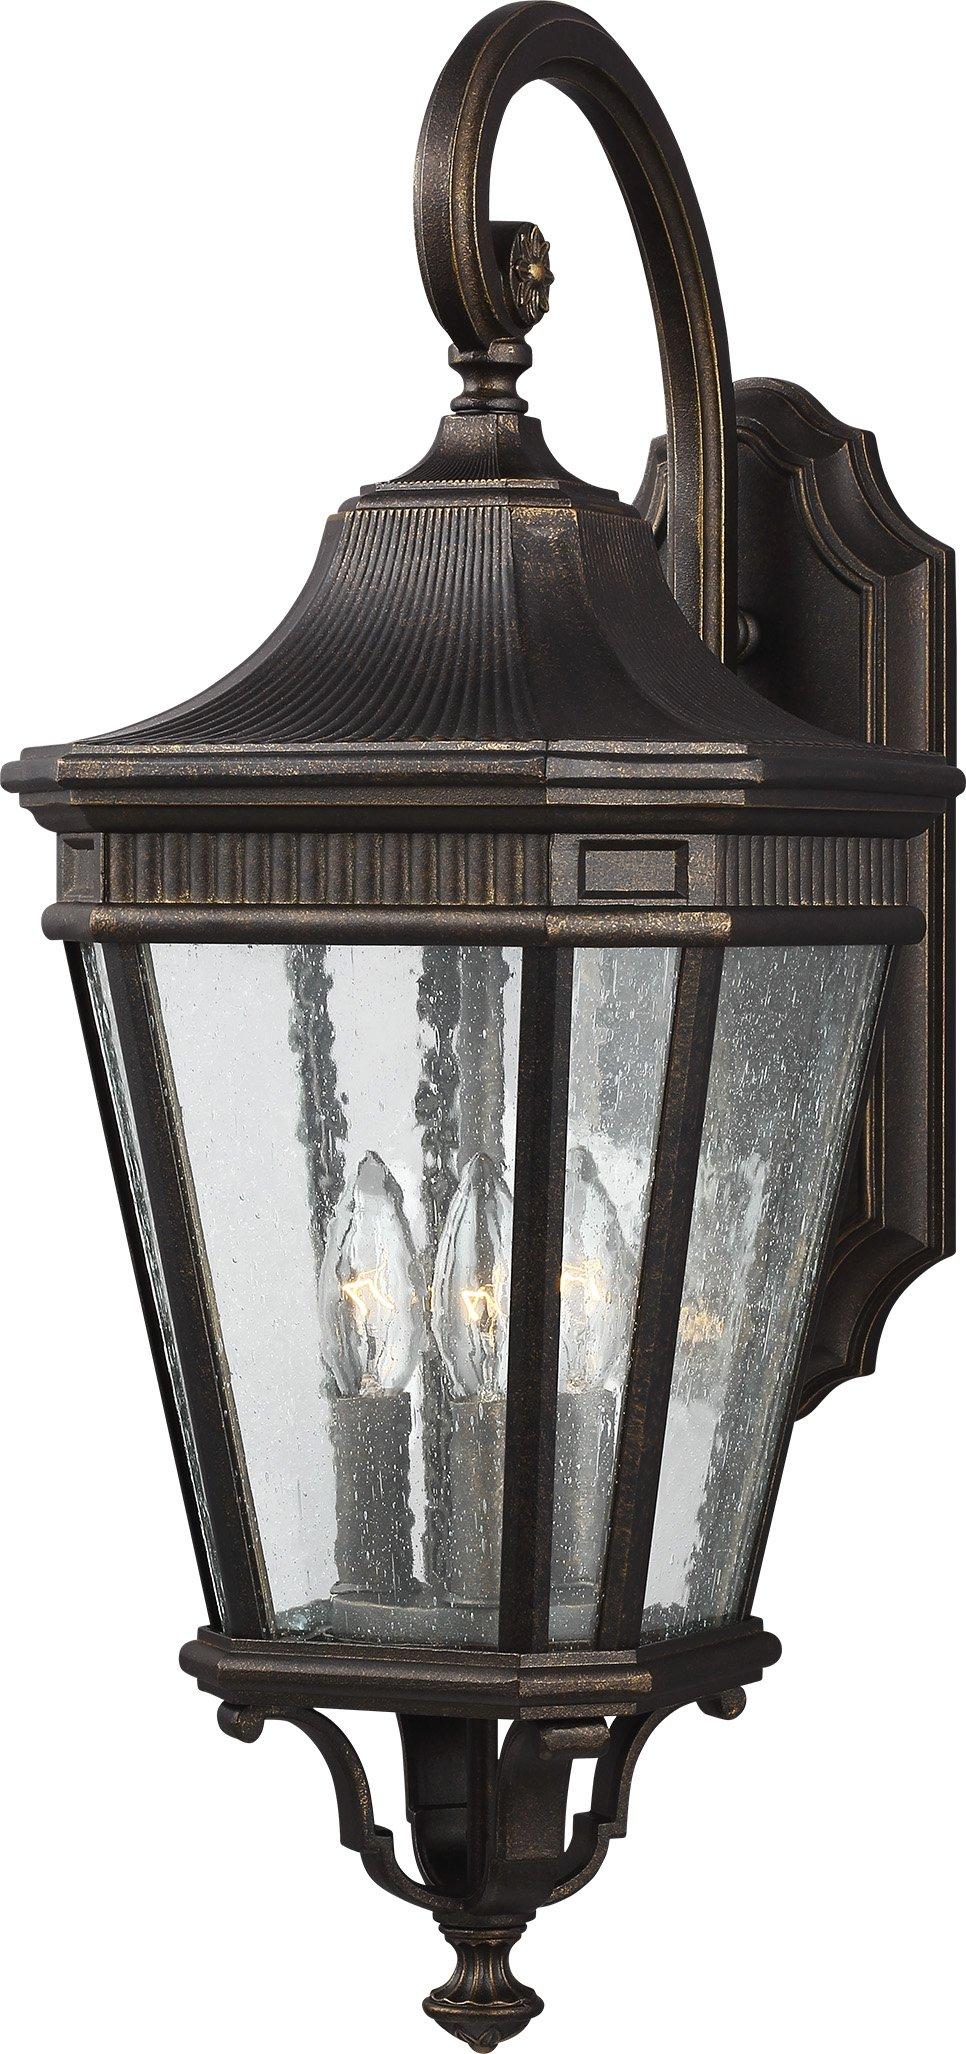 Feiss OL5422GBZ Cotswold Lane Outdoor Patio Lighting Wall Lantern, Bronze, 3-Light (10''W x 24''H) 180watts